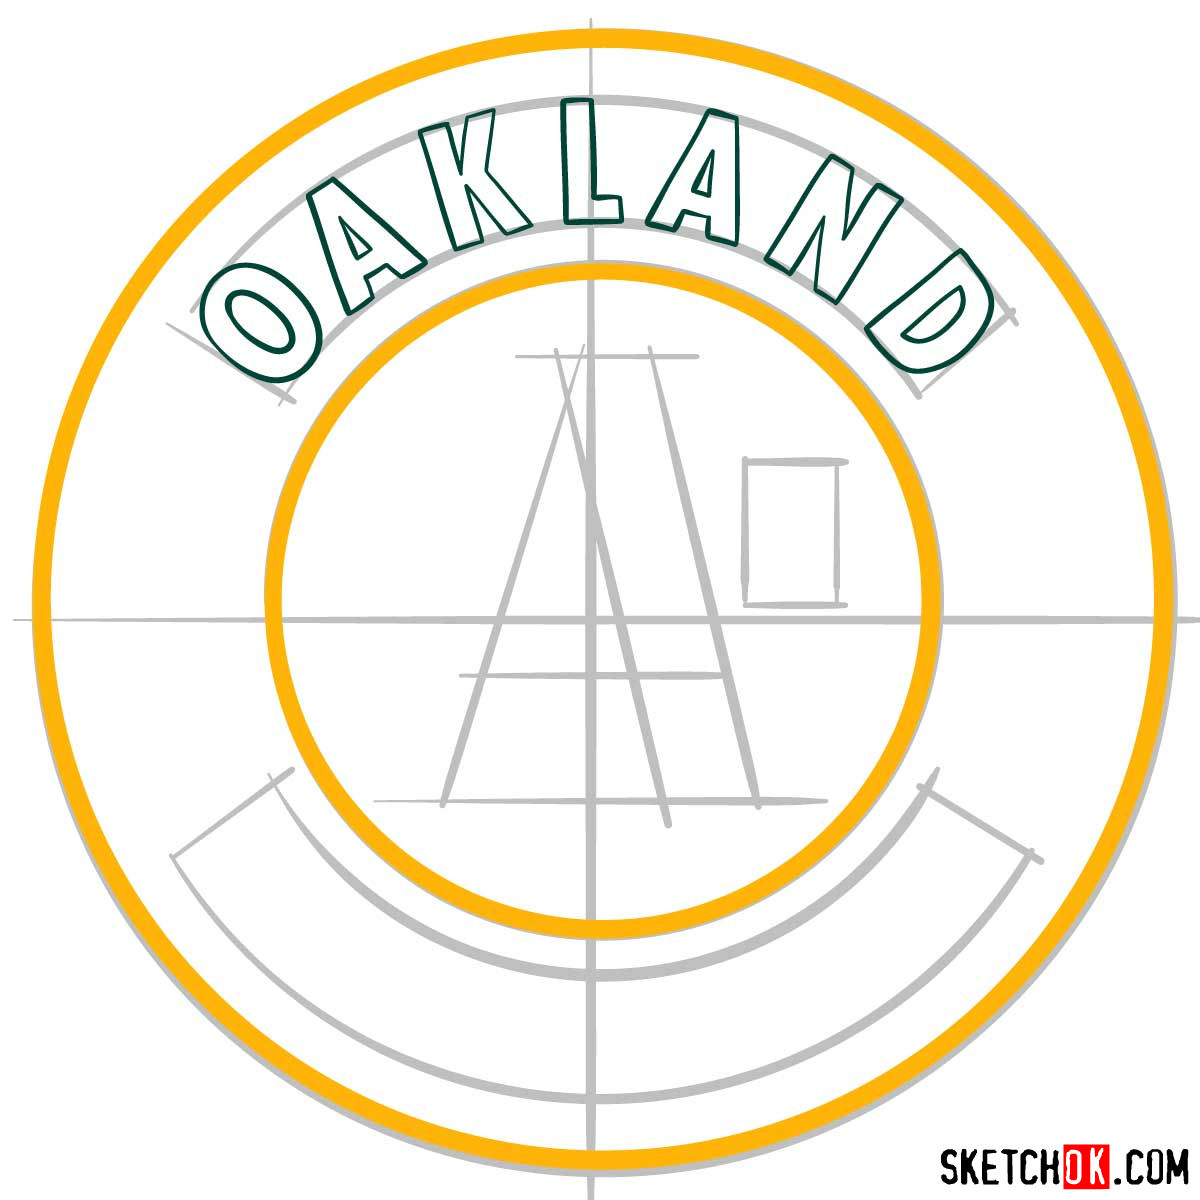 How to draw Oakland Athletics logo | MLB logos - step 05